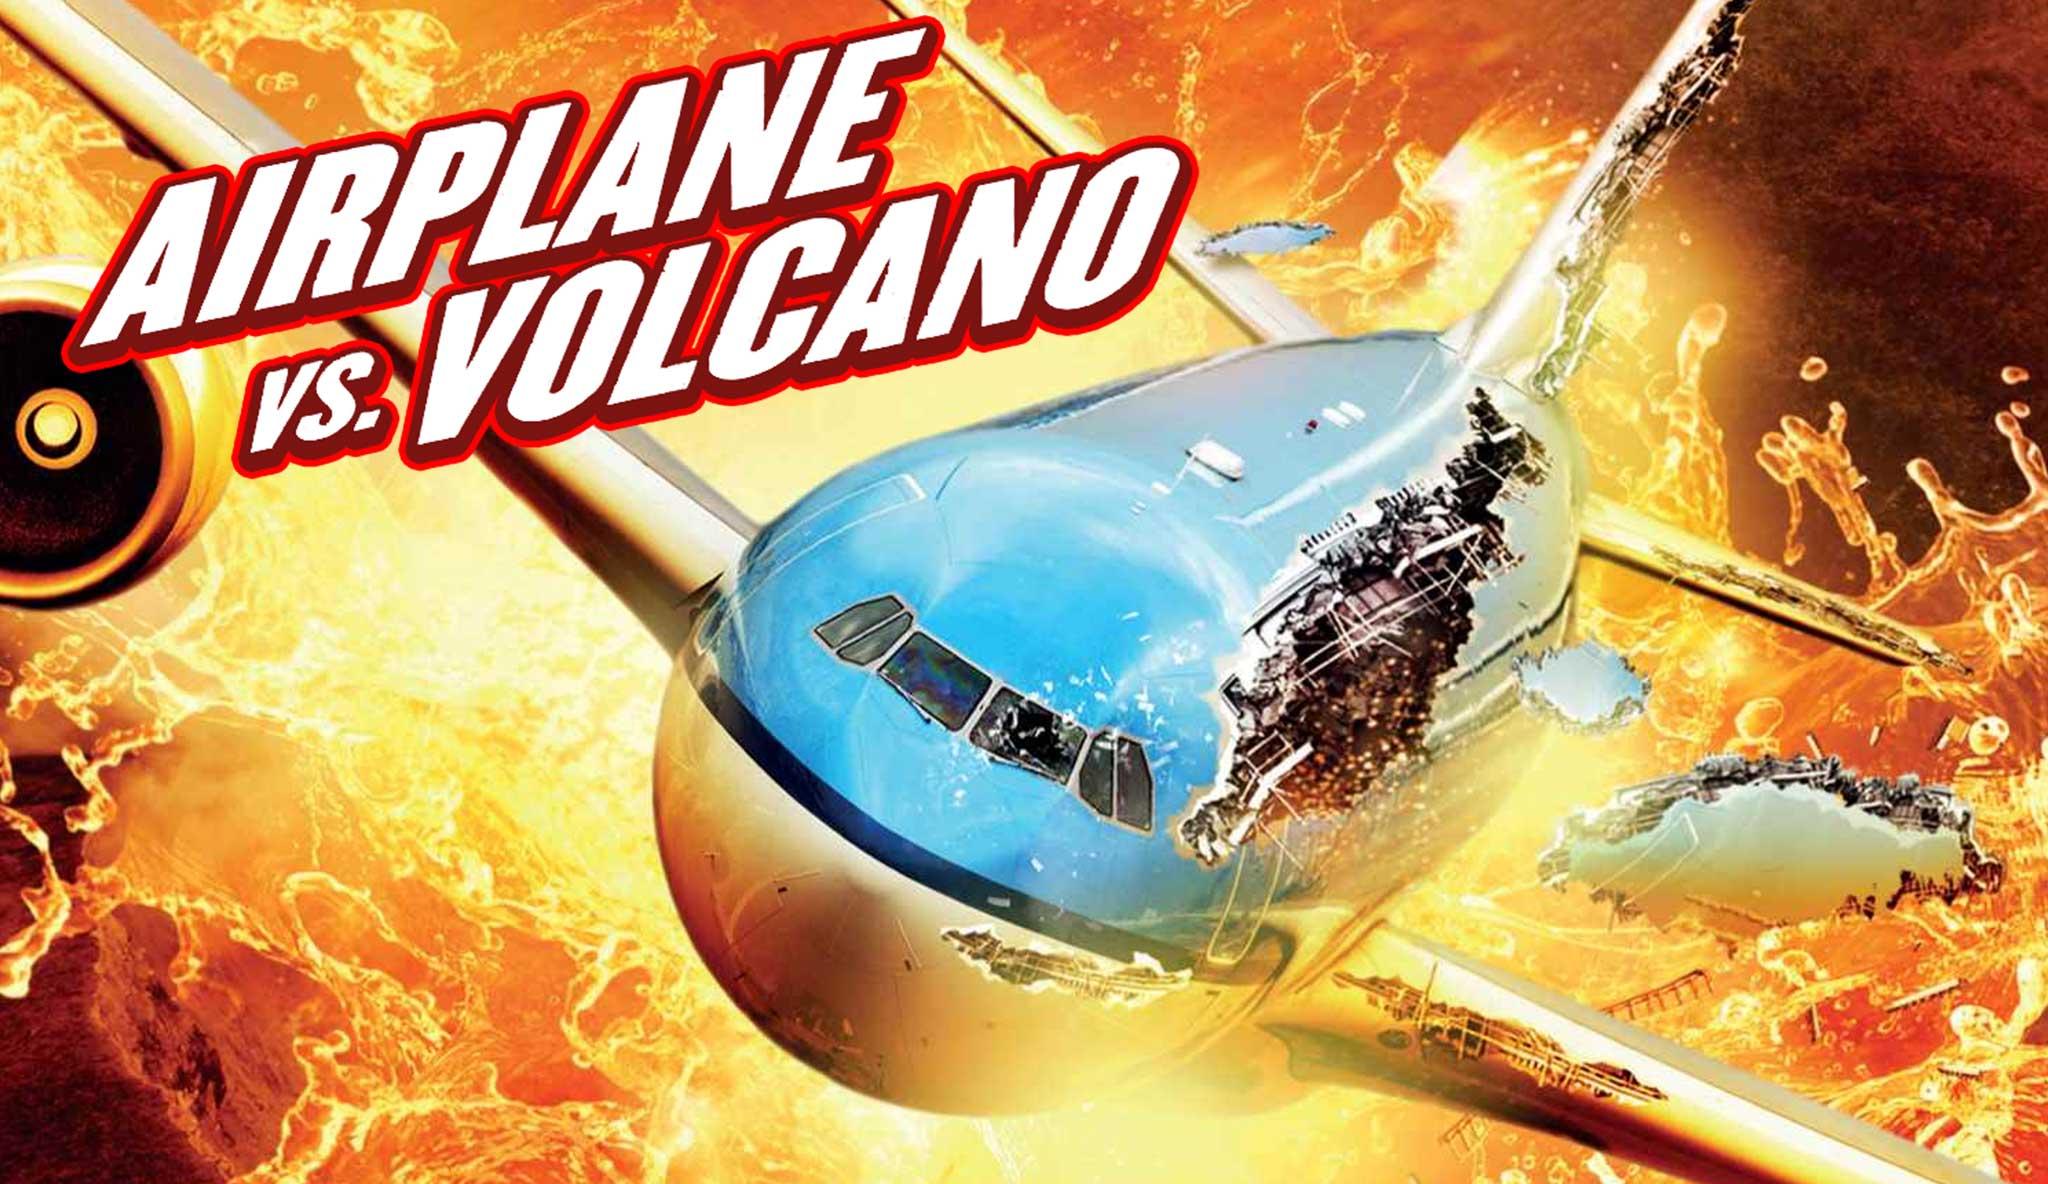 airplane-vs-volcano\header.jpg